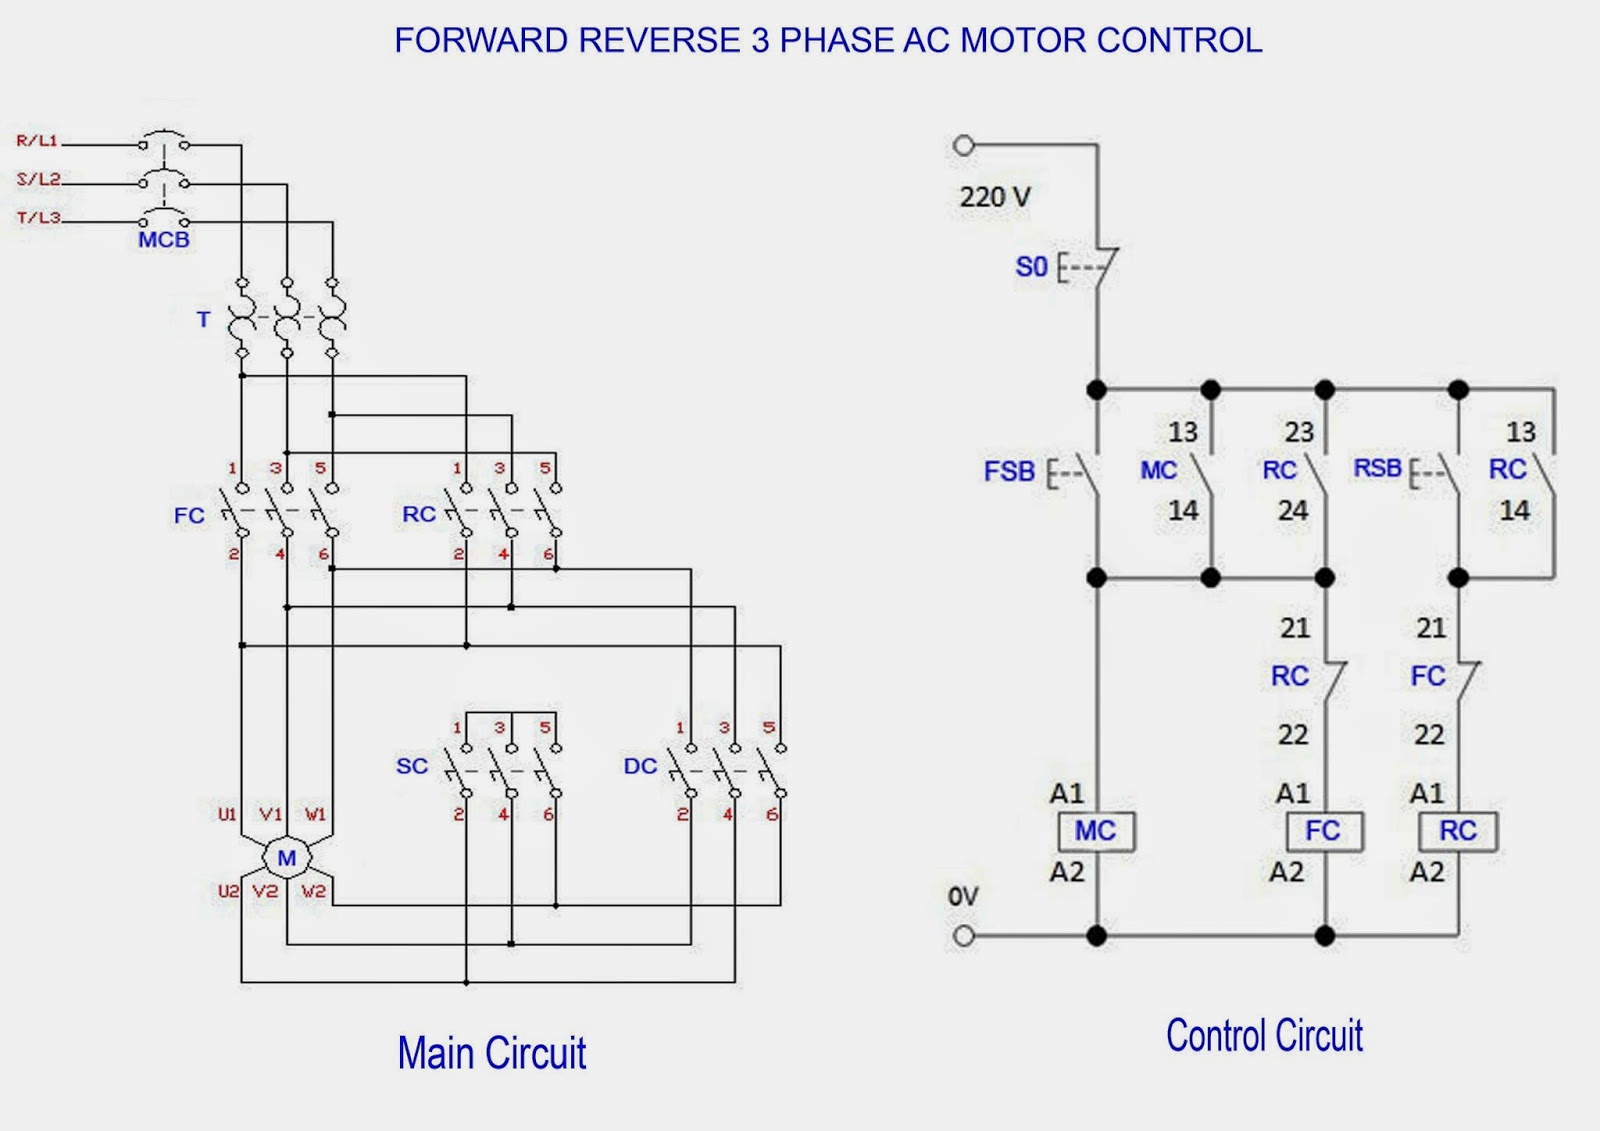 Wiring Diagram Forward - Wiring Diagram Detailed - 5 Wire Motor Wiring Diagram